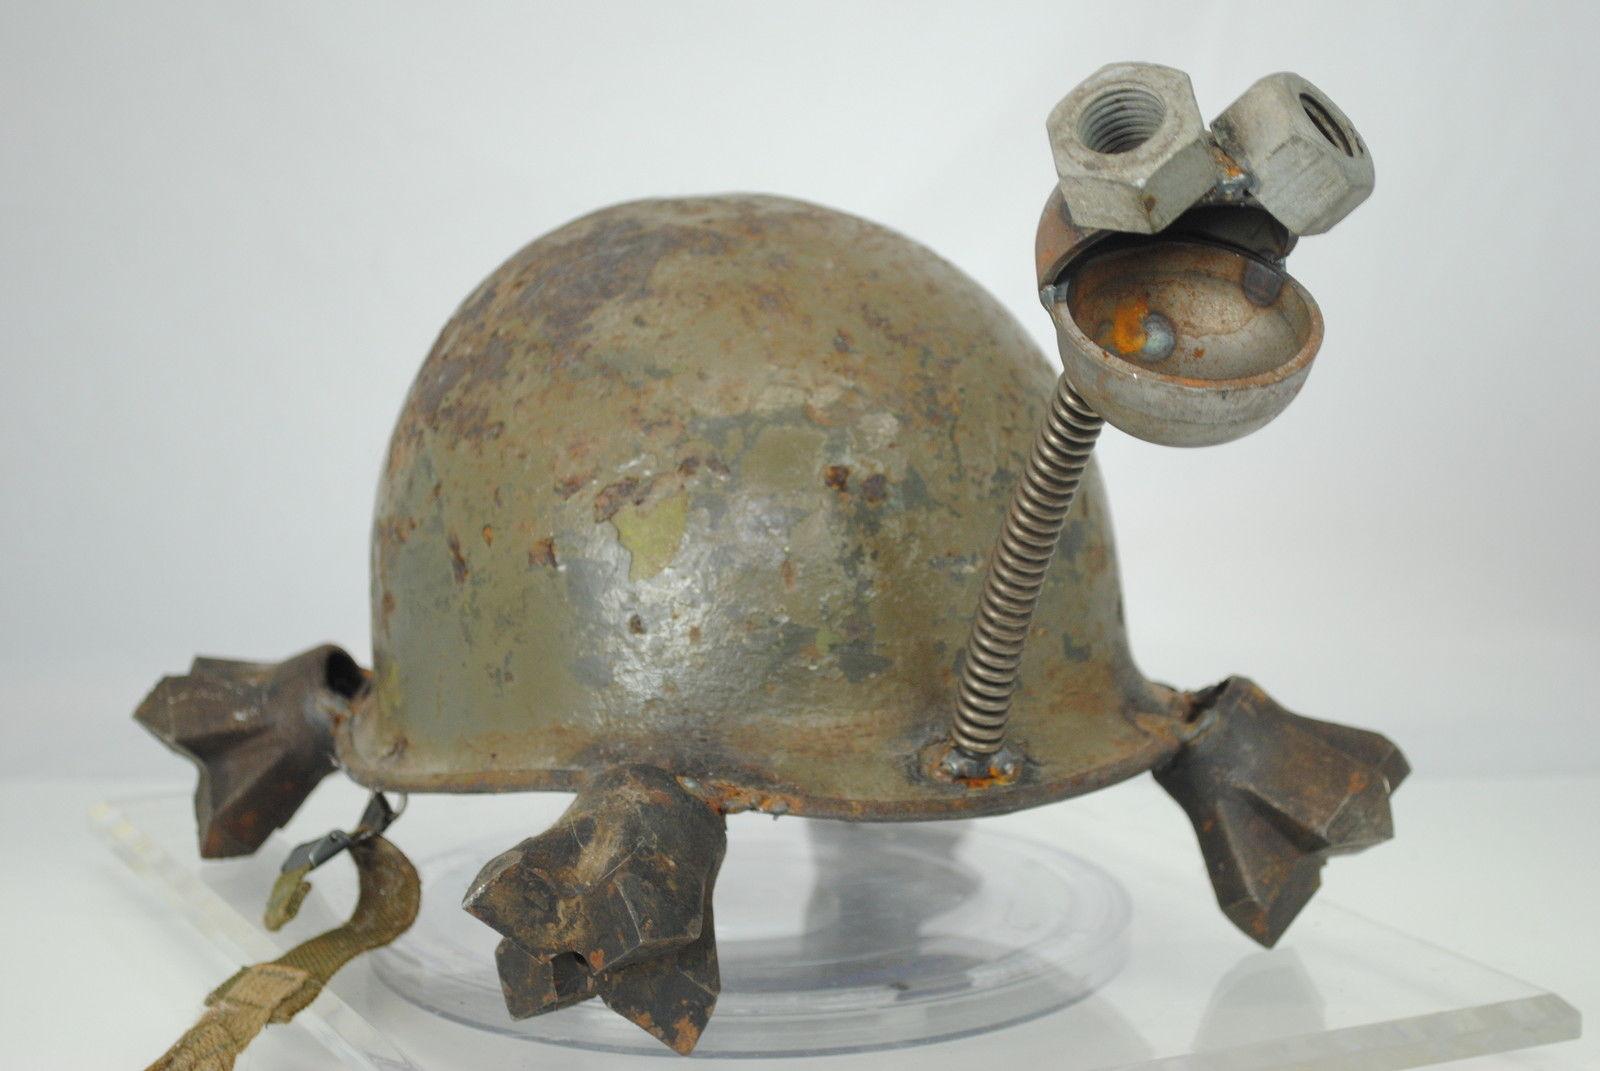 Super Rare Find M1 Turtle Shell Helmet